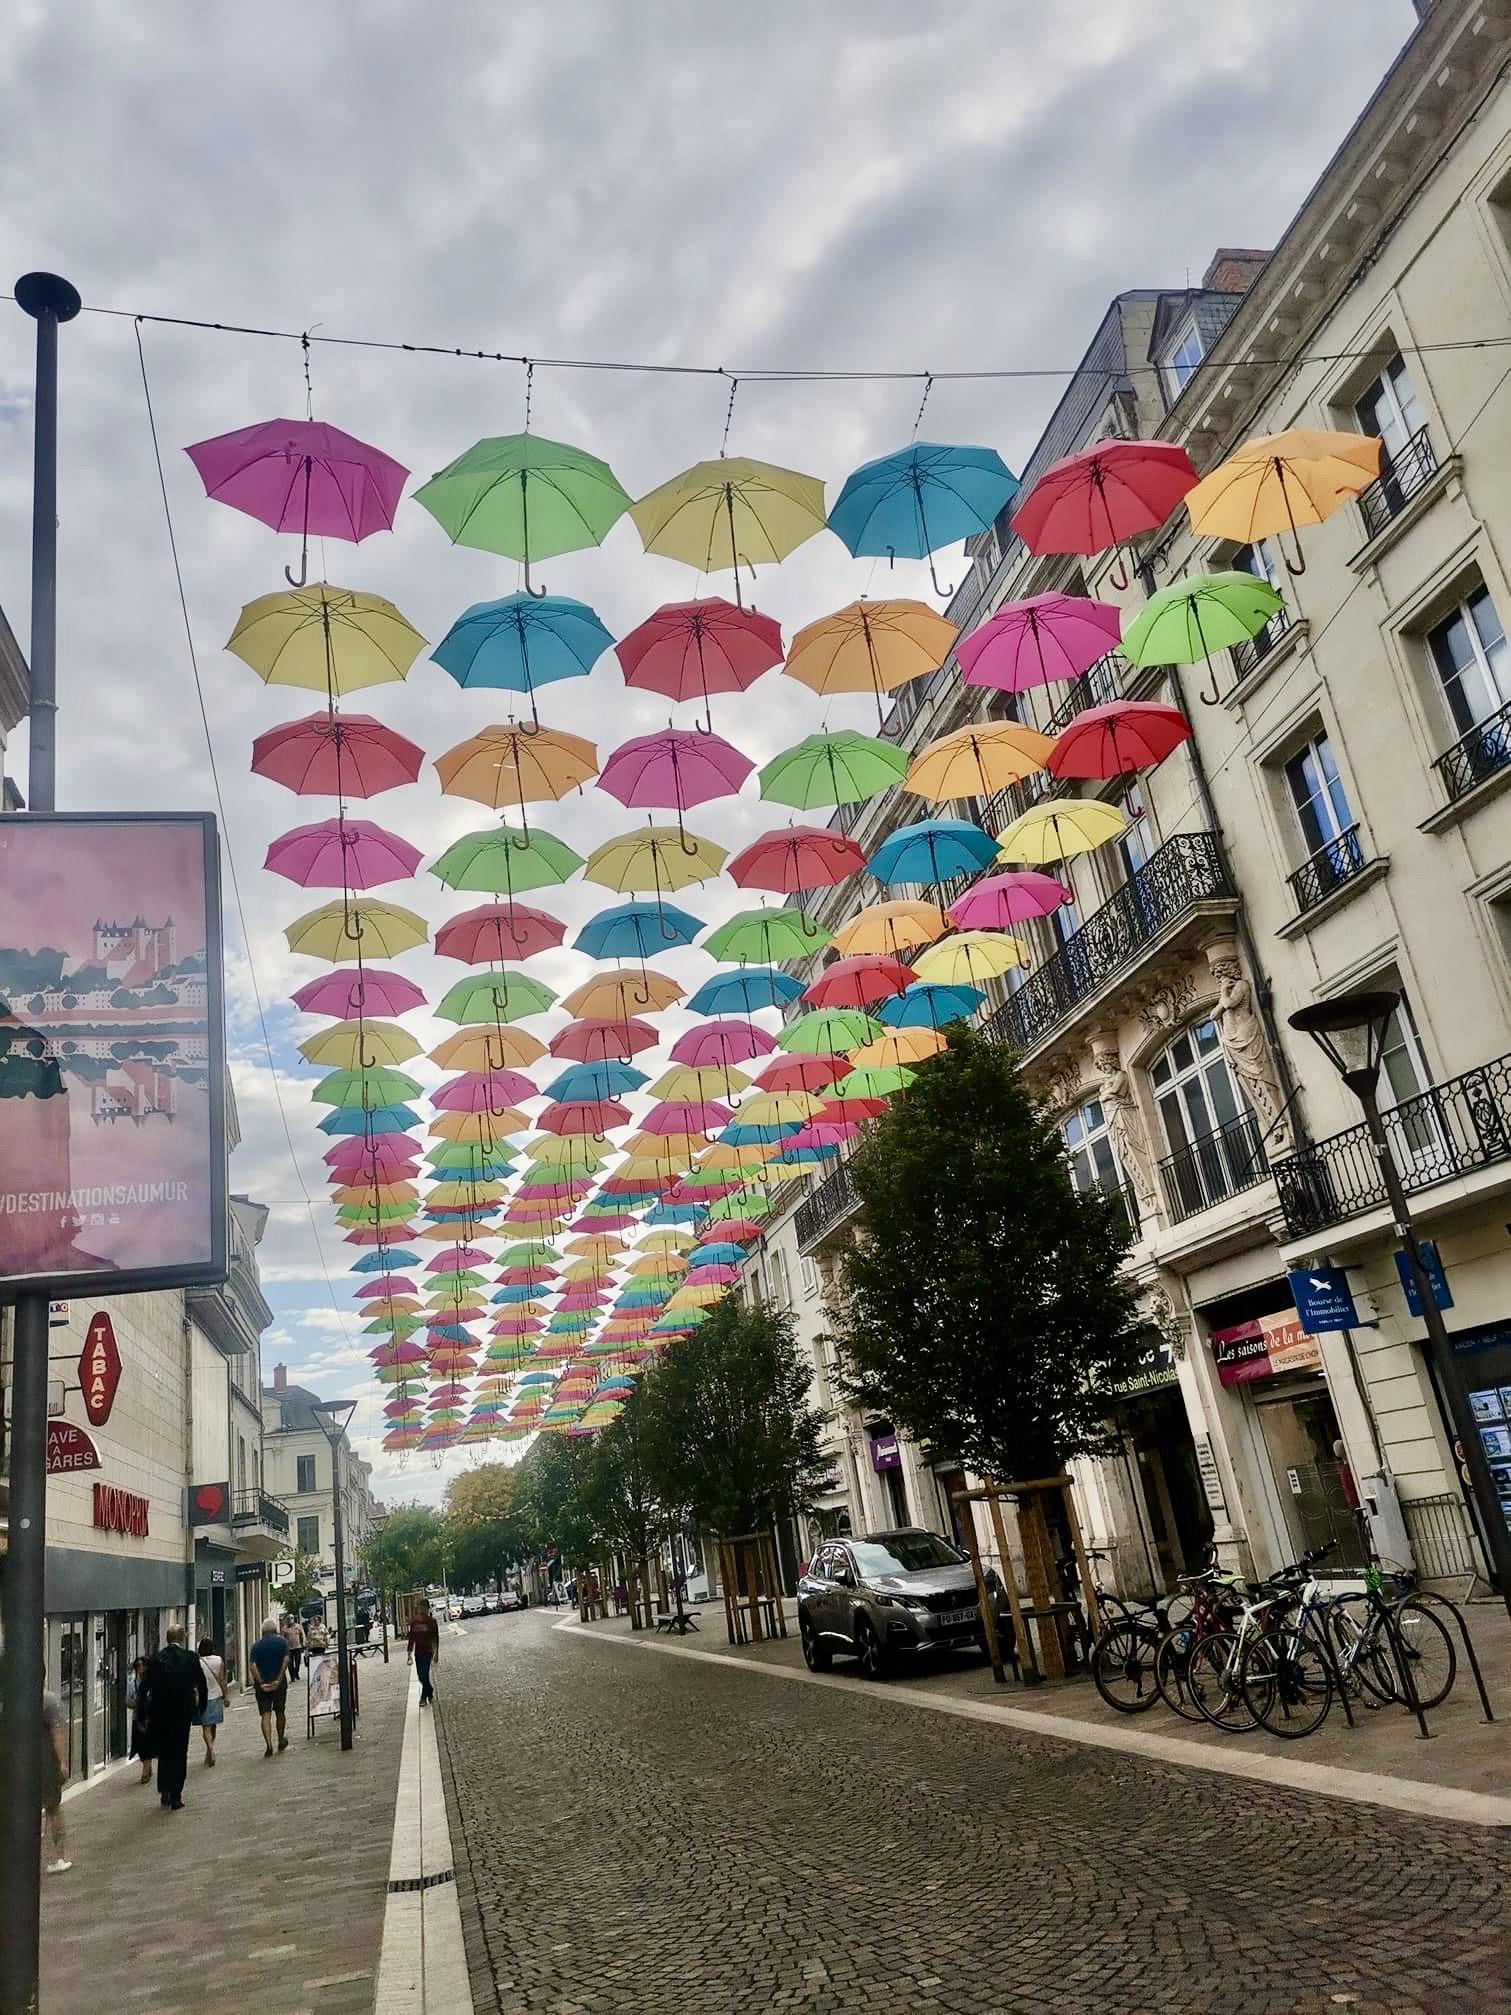 Parapluies_Saumur_Clément CHOTARD